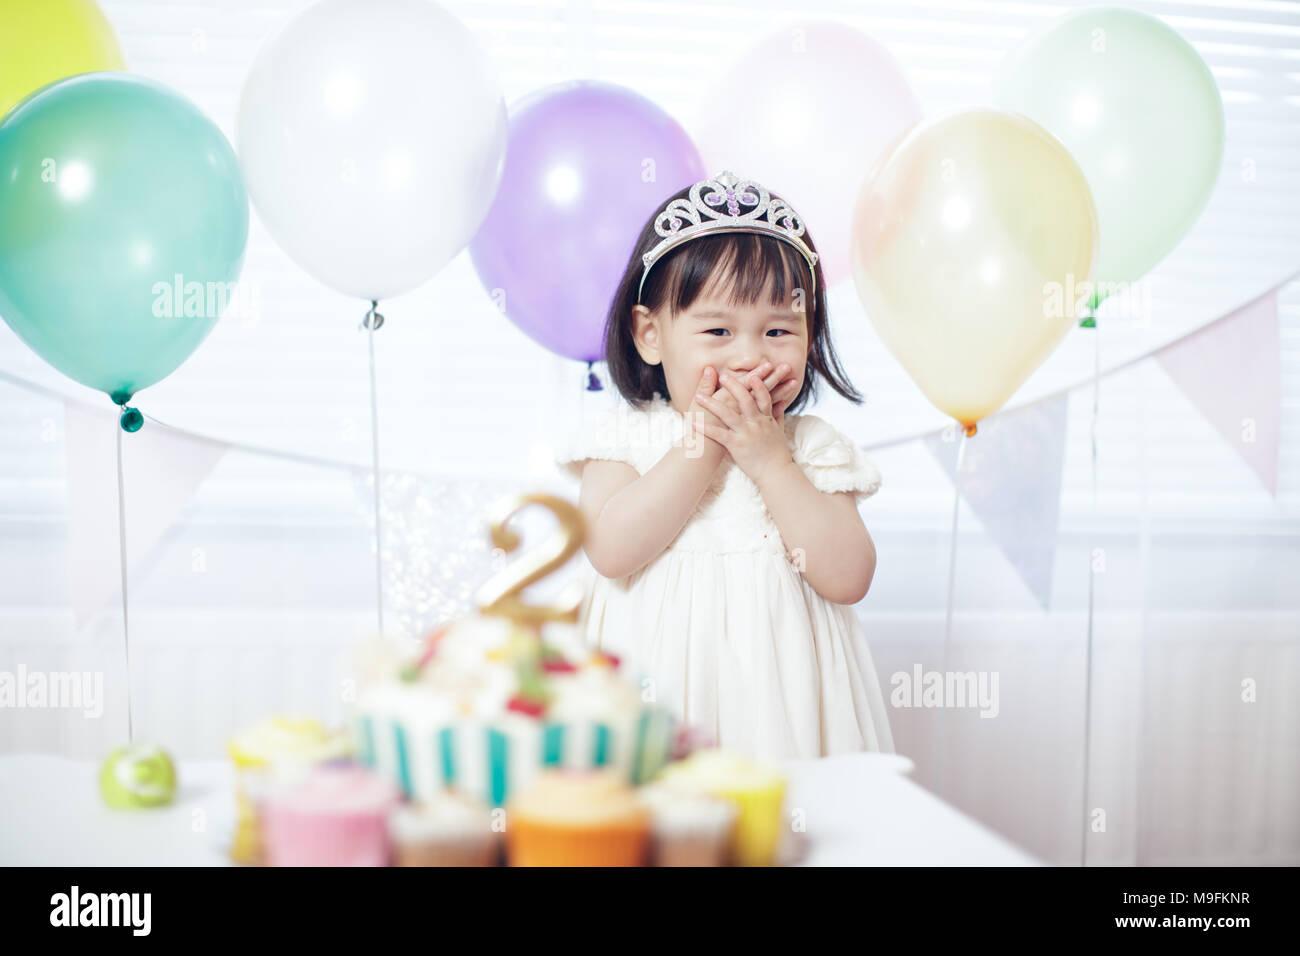 Baby Girl celebra su segundo cumpleaños Imagen De Stock